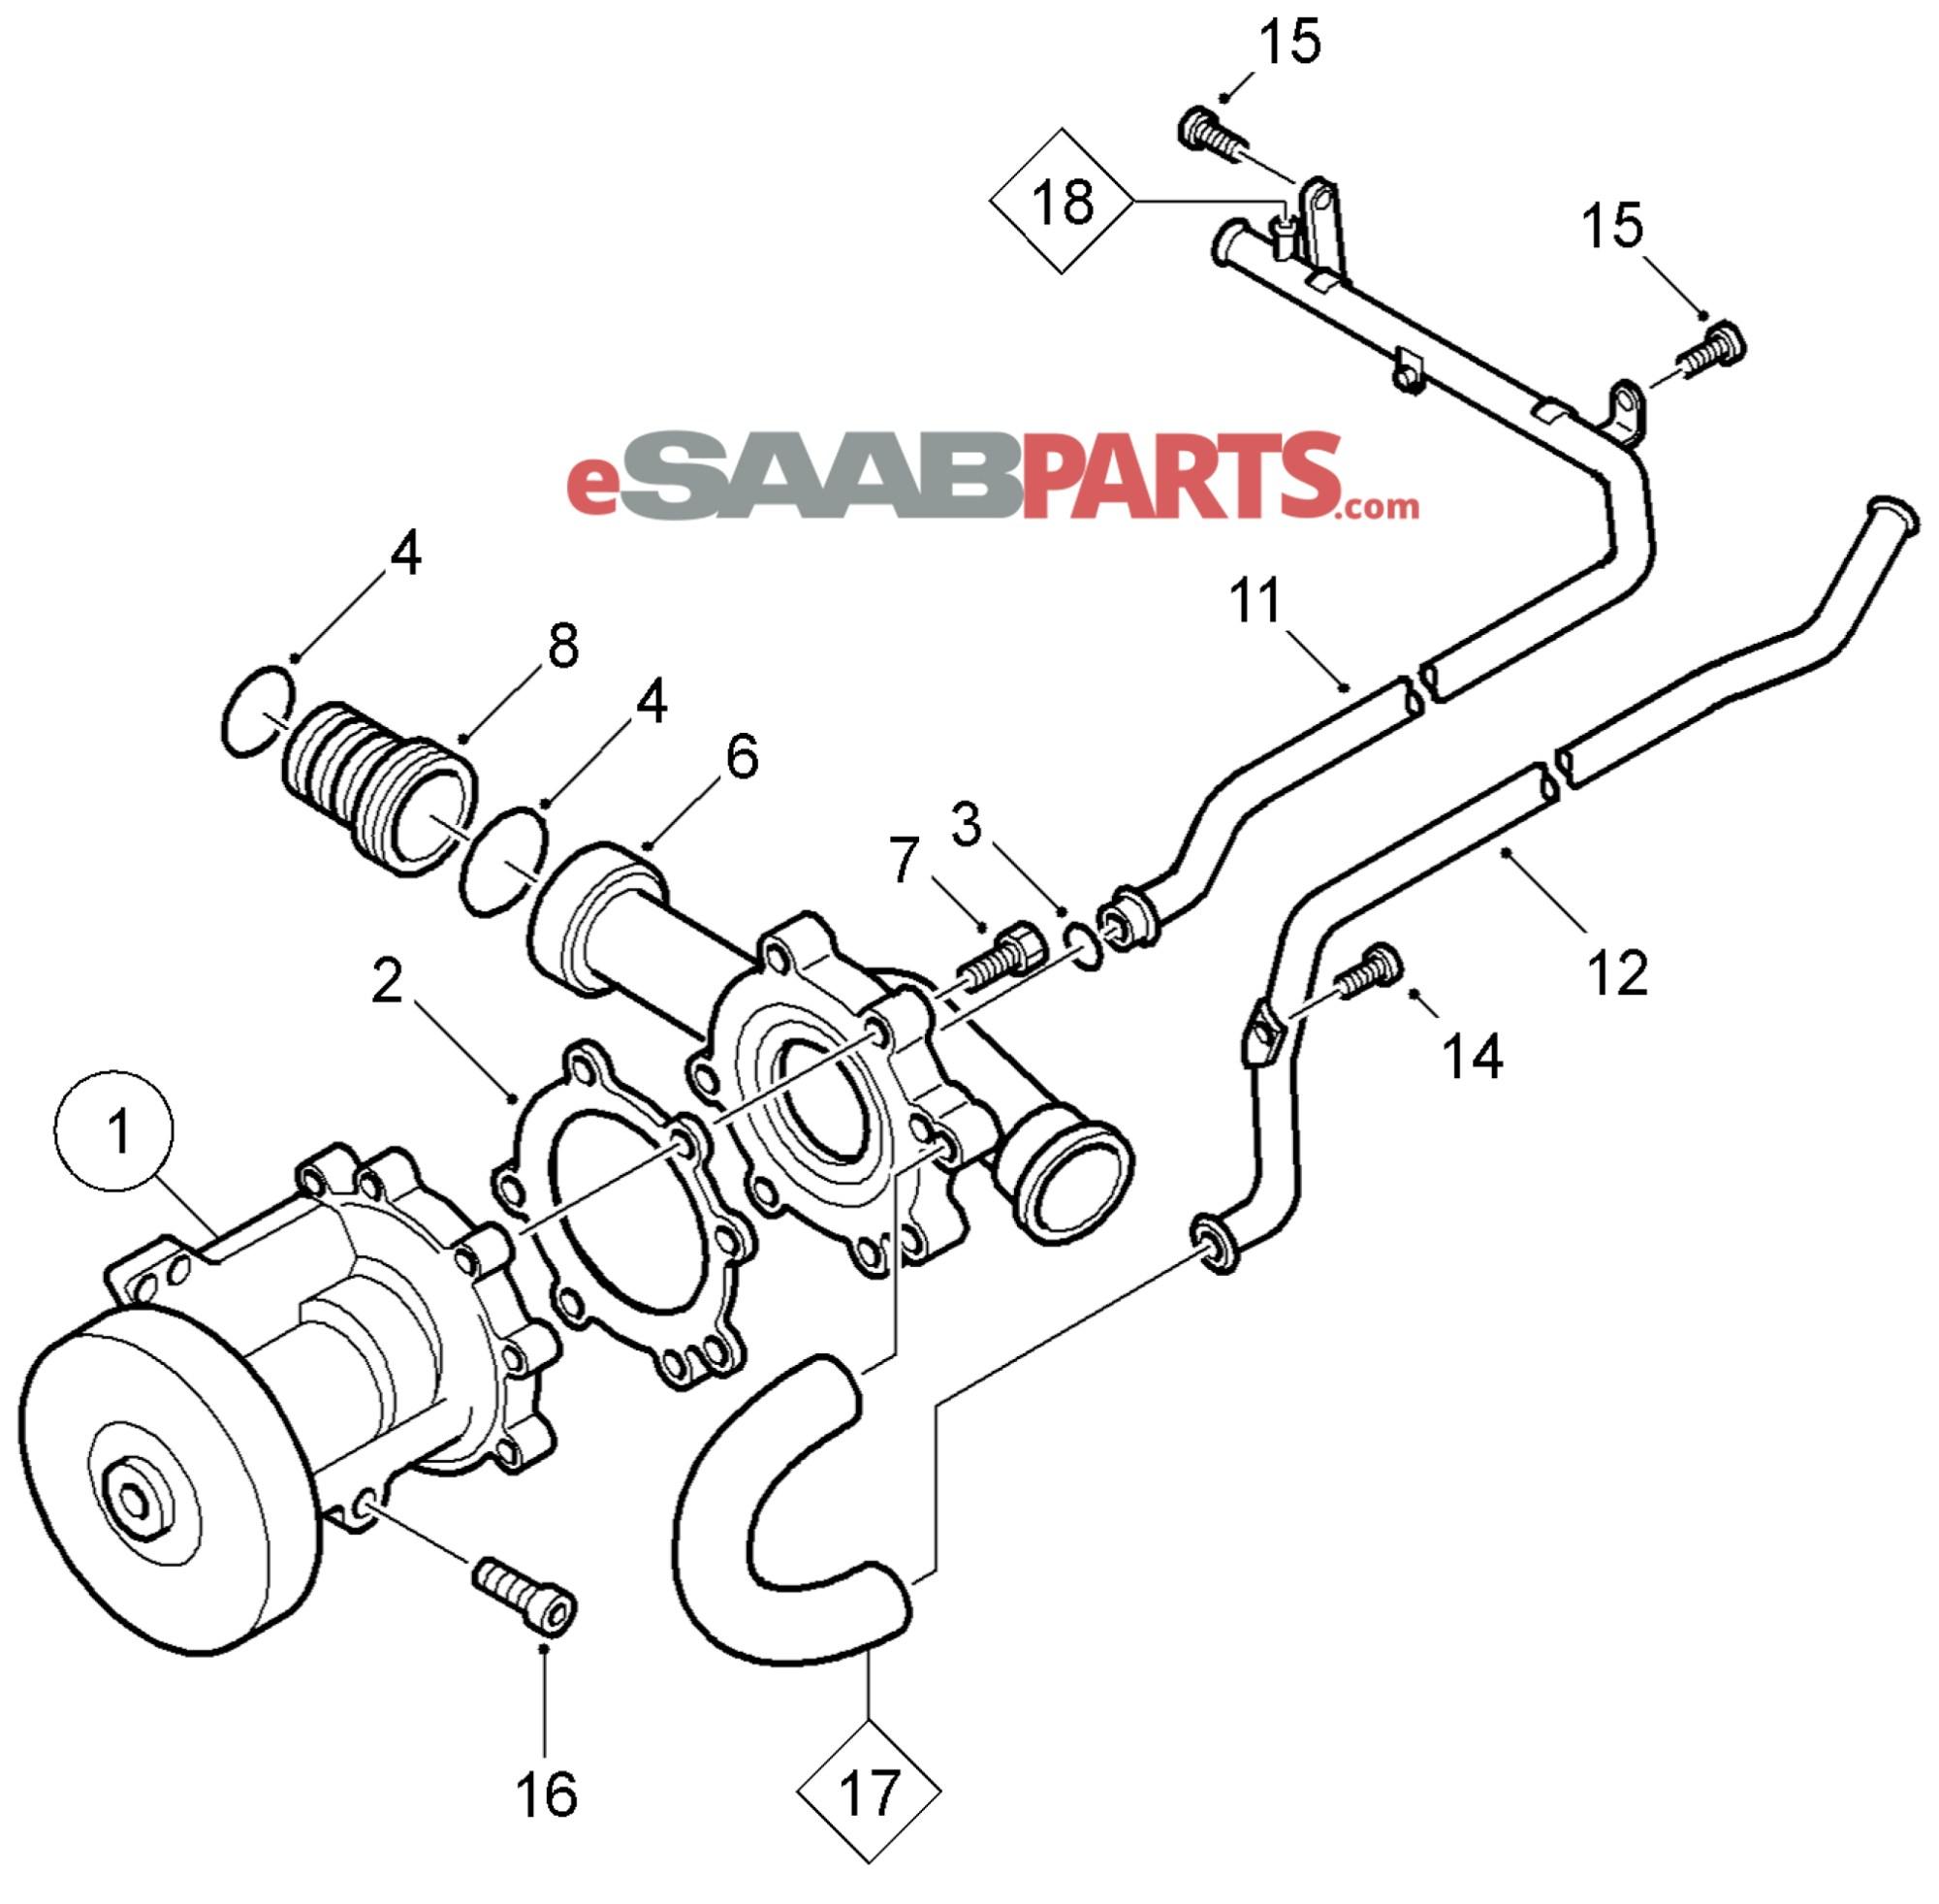 hight resolution of esaabparts com saab 9 5 9600 engine parts water pump water pump coolant b205 b235